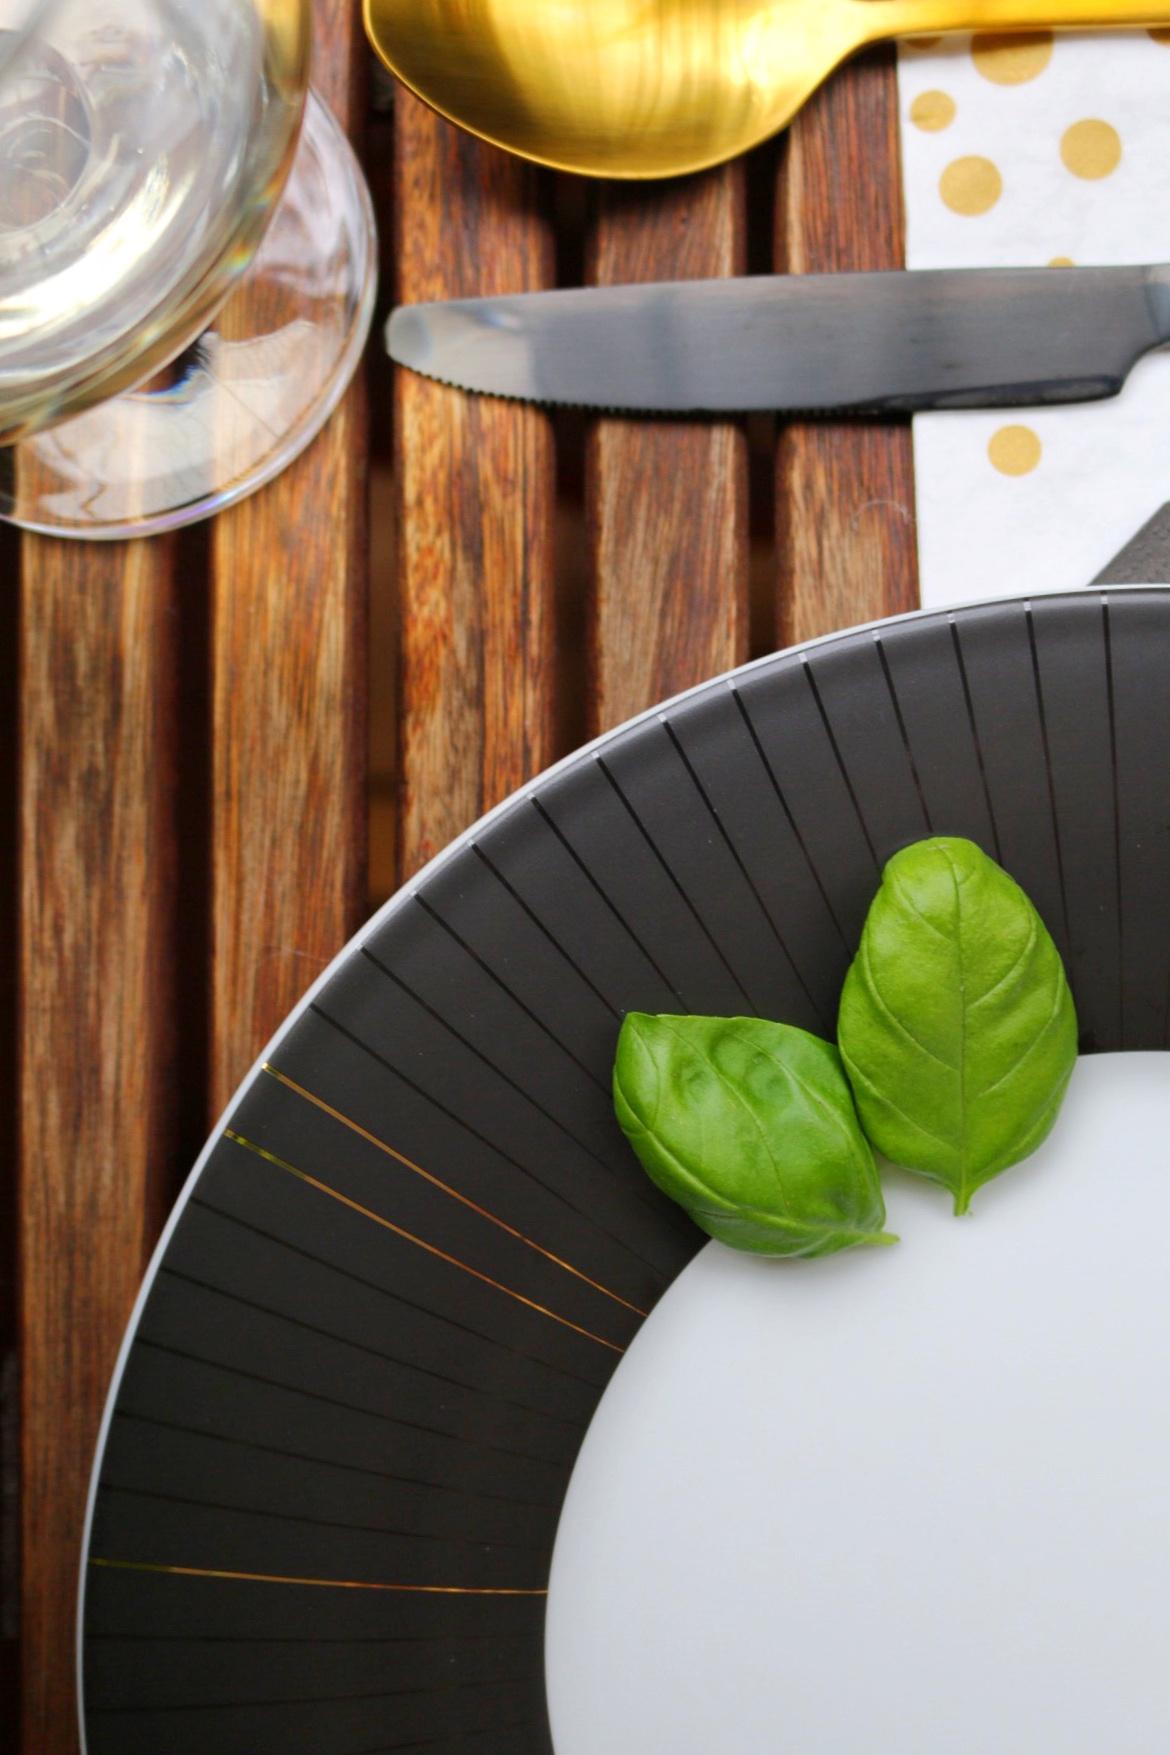 Diner en noir - Bunter Gemüseauflauf by eat blog love